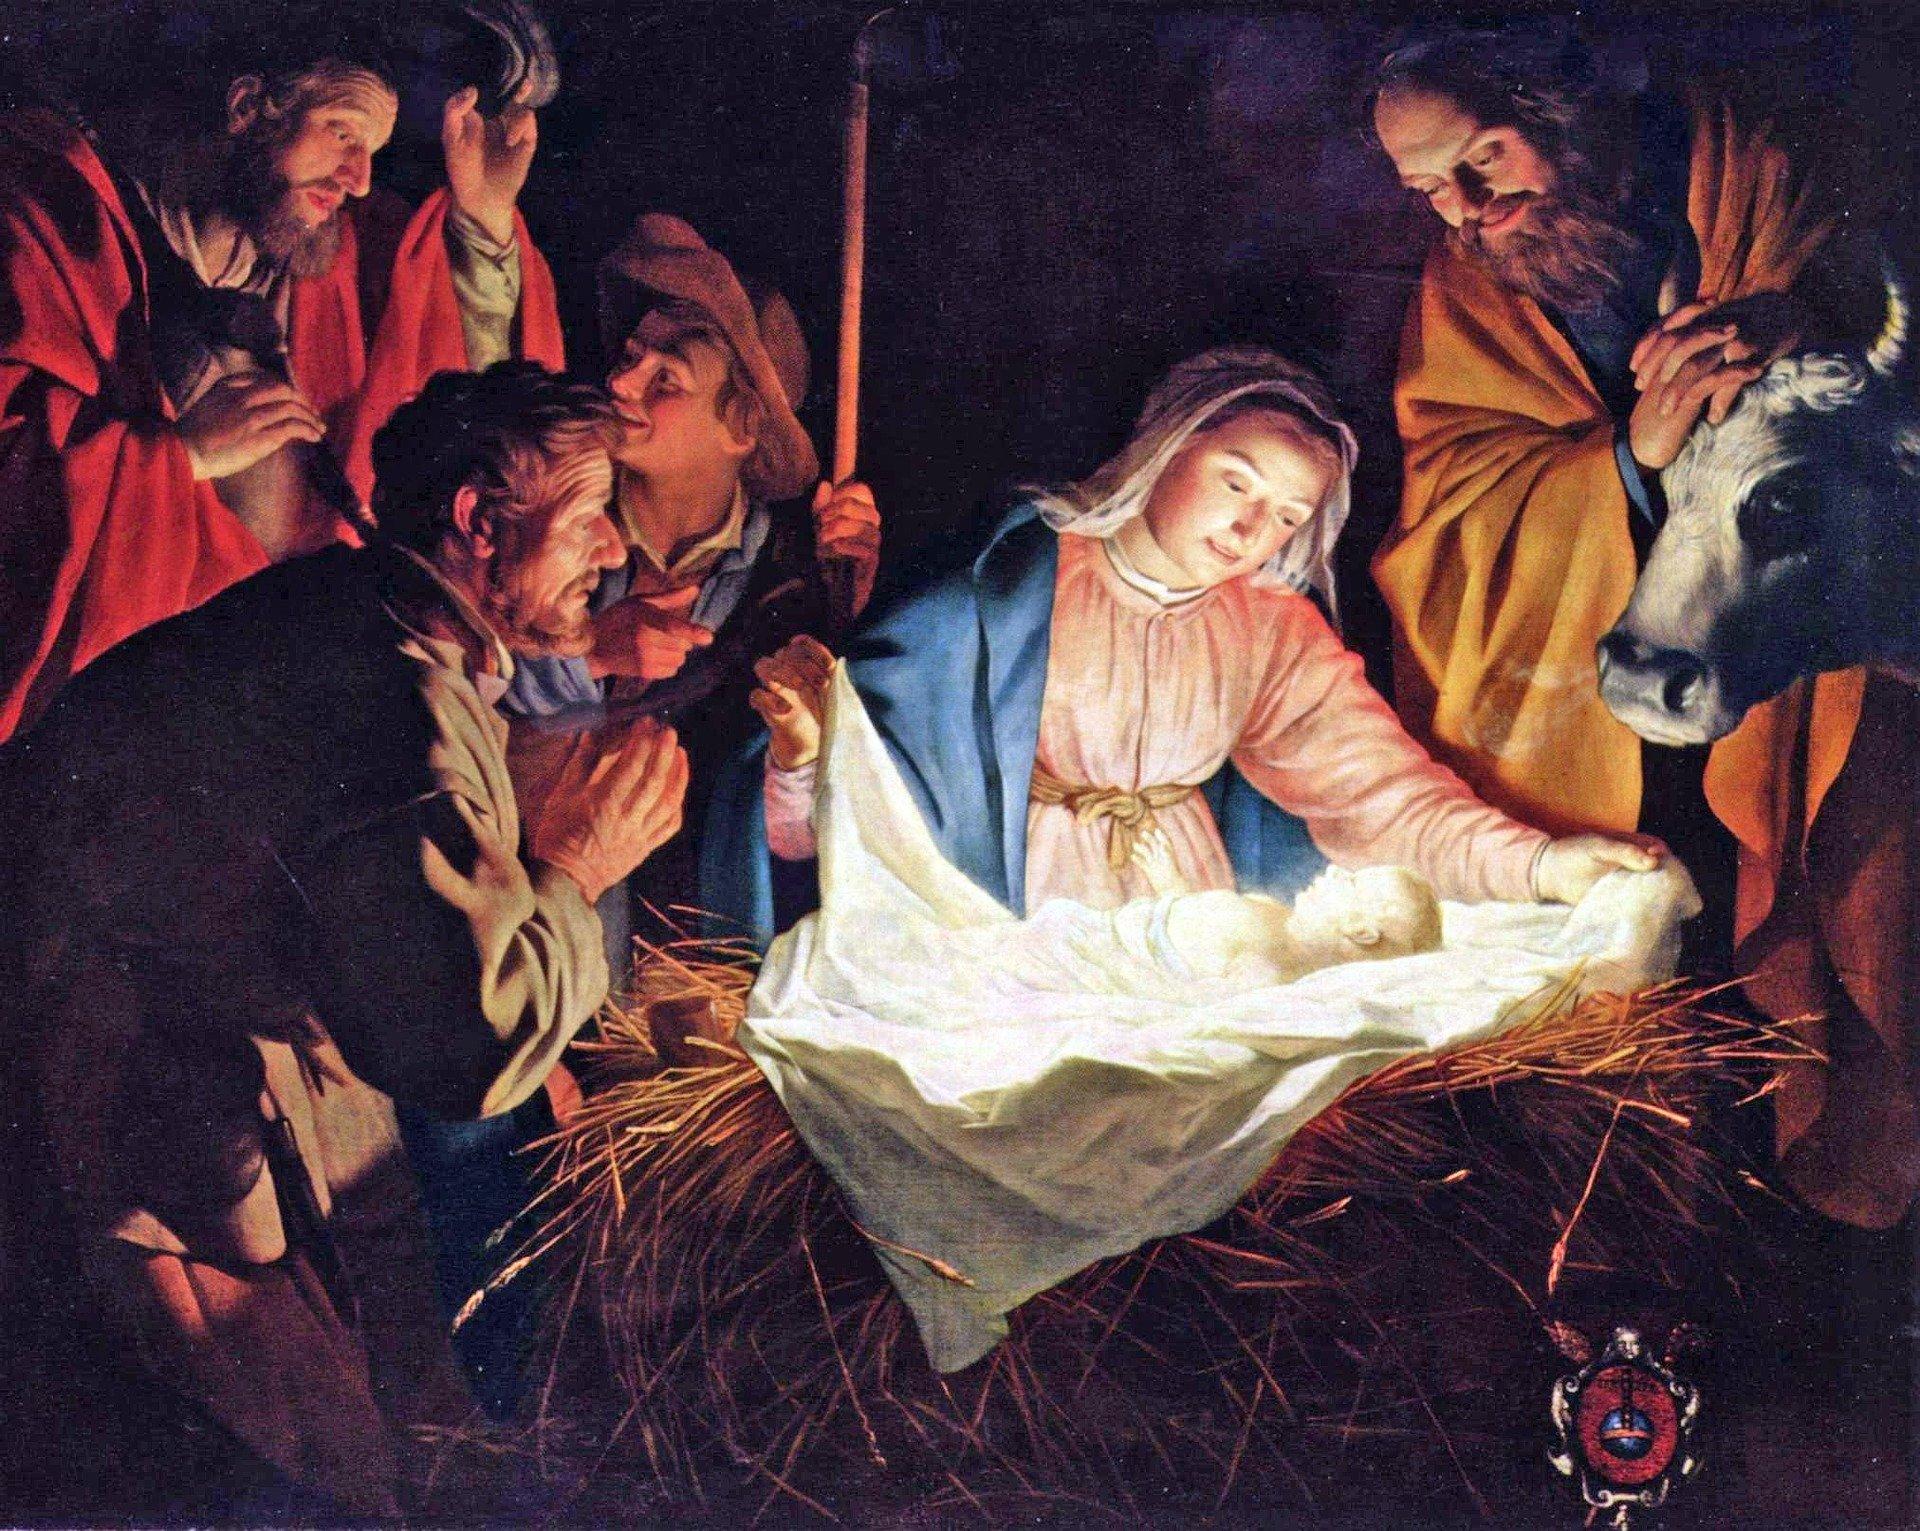 birth-of-jesus-1150128_1920